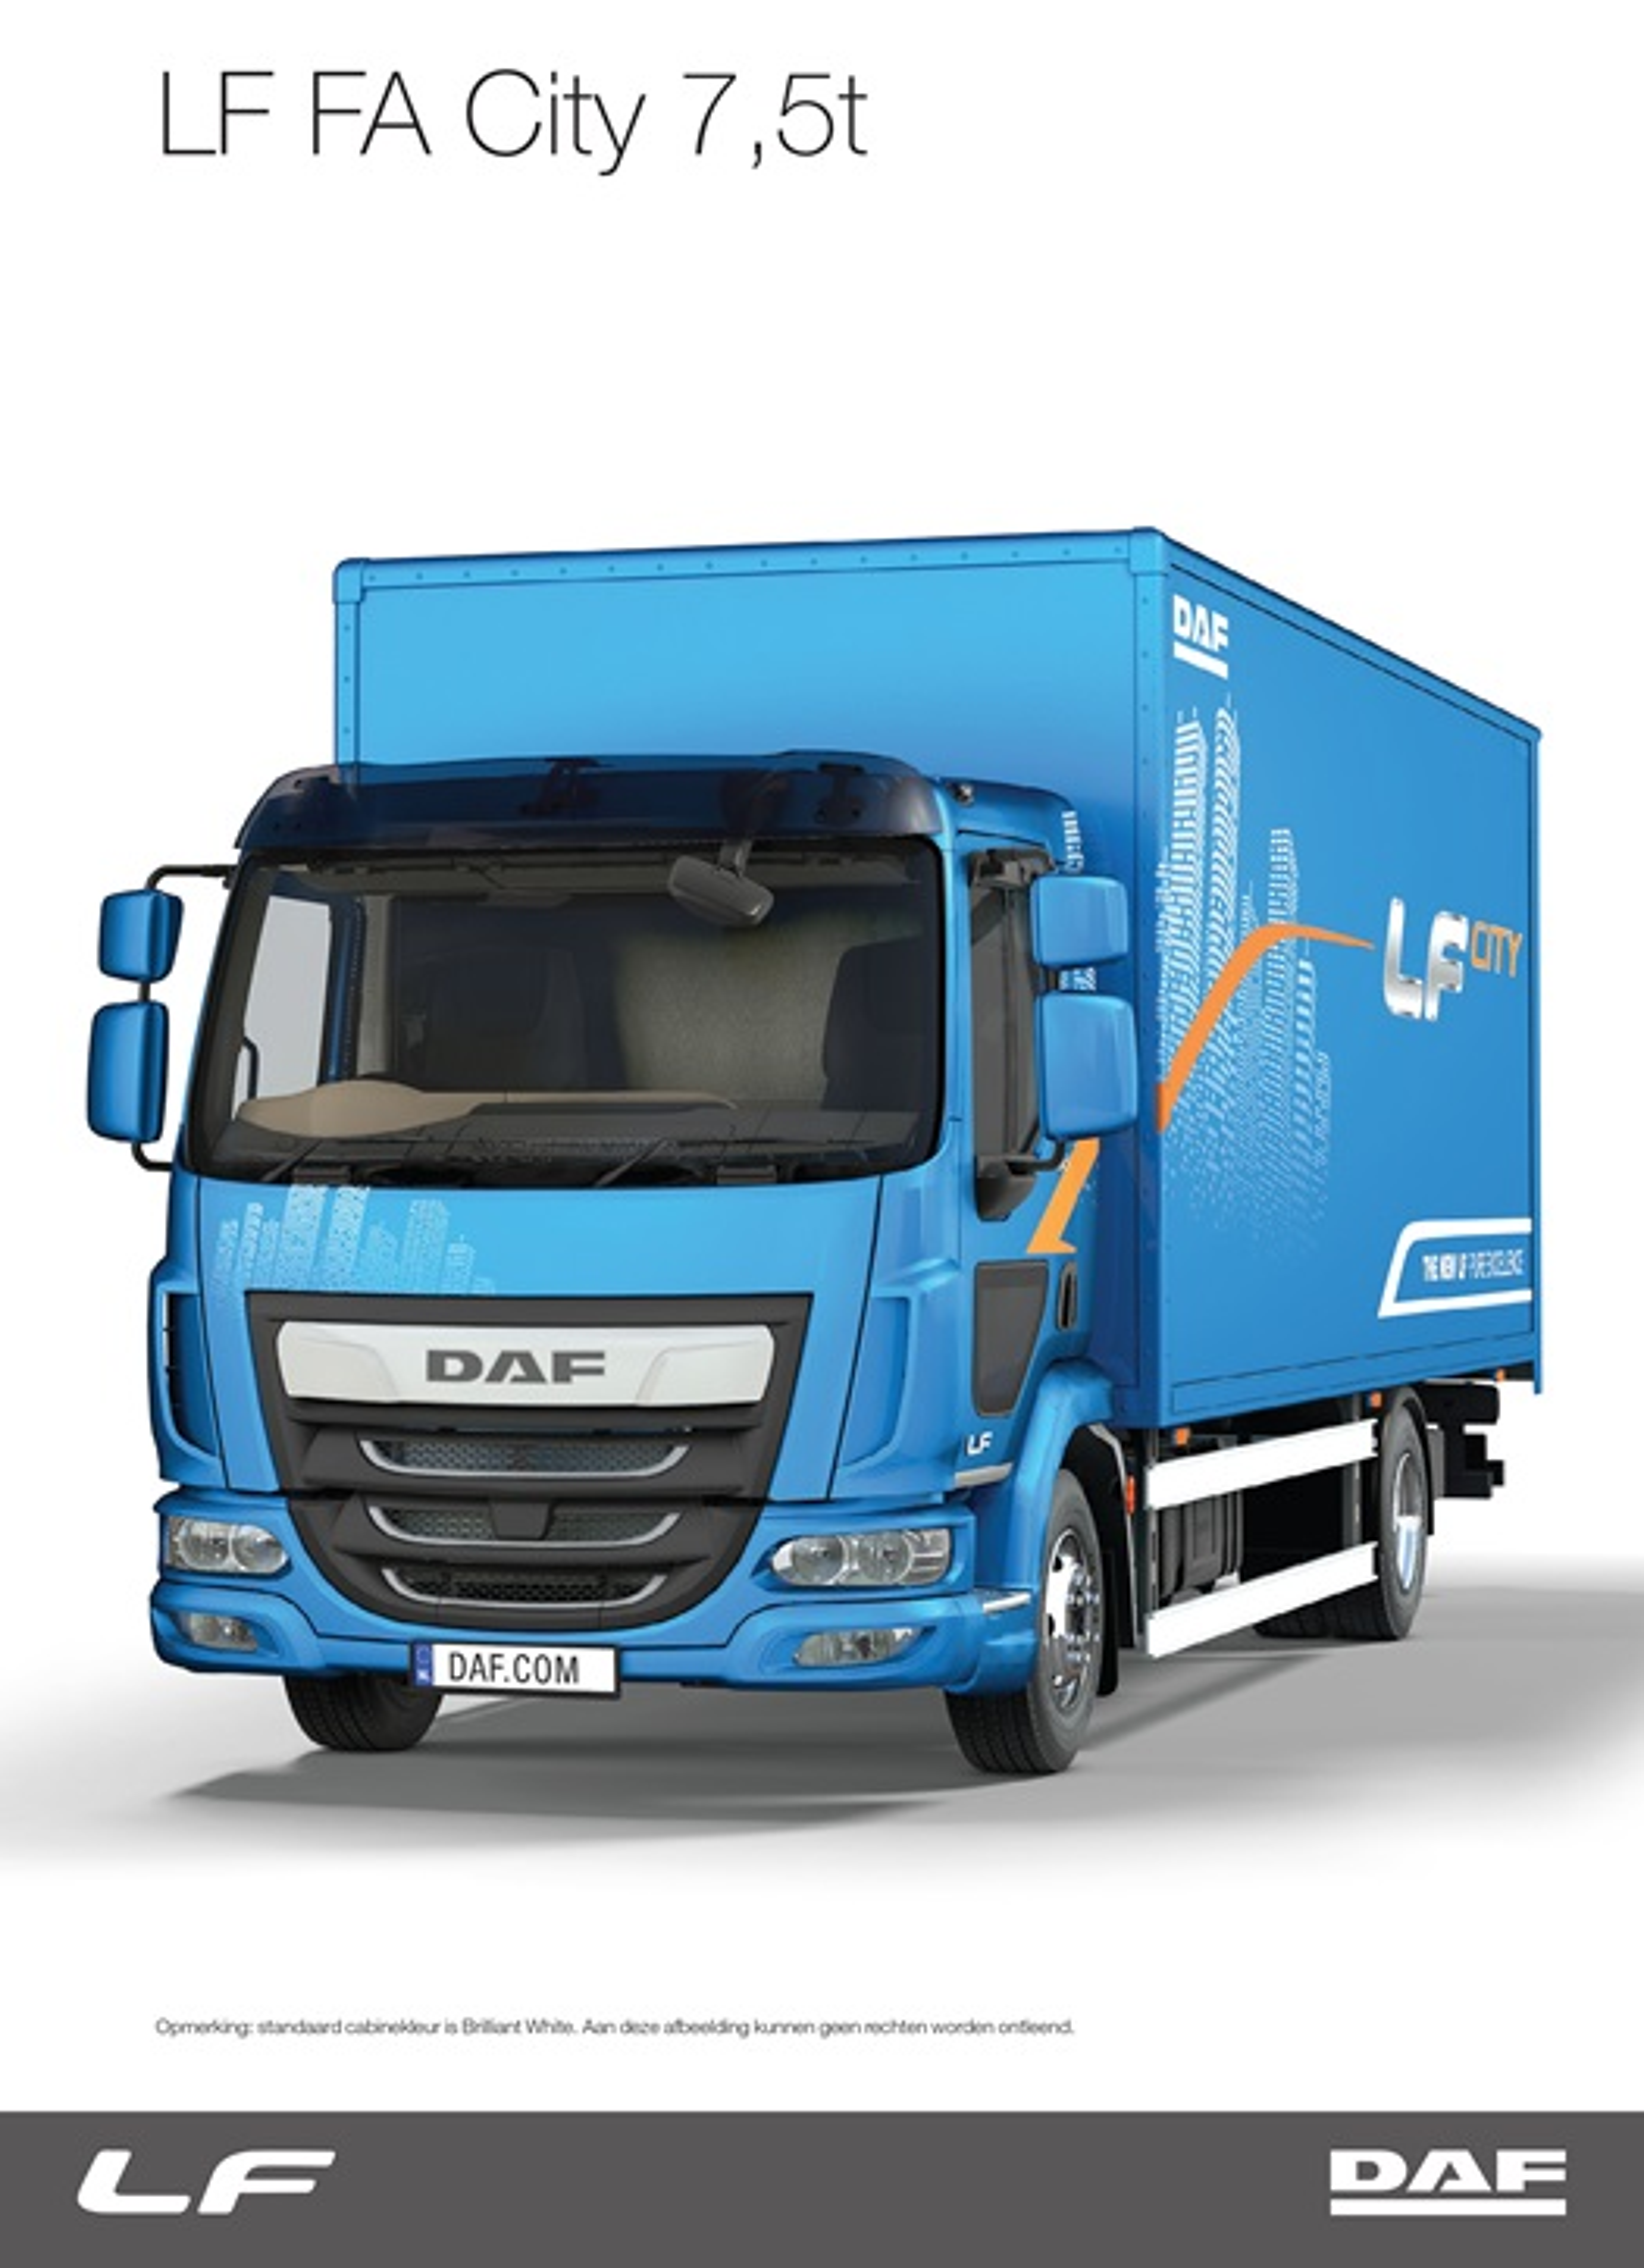 DAF LF- DAF Trucks Ltd, United Kingdom